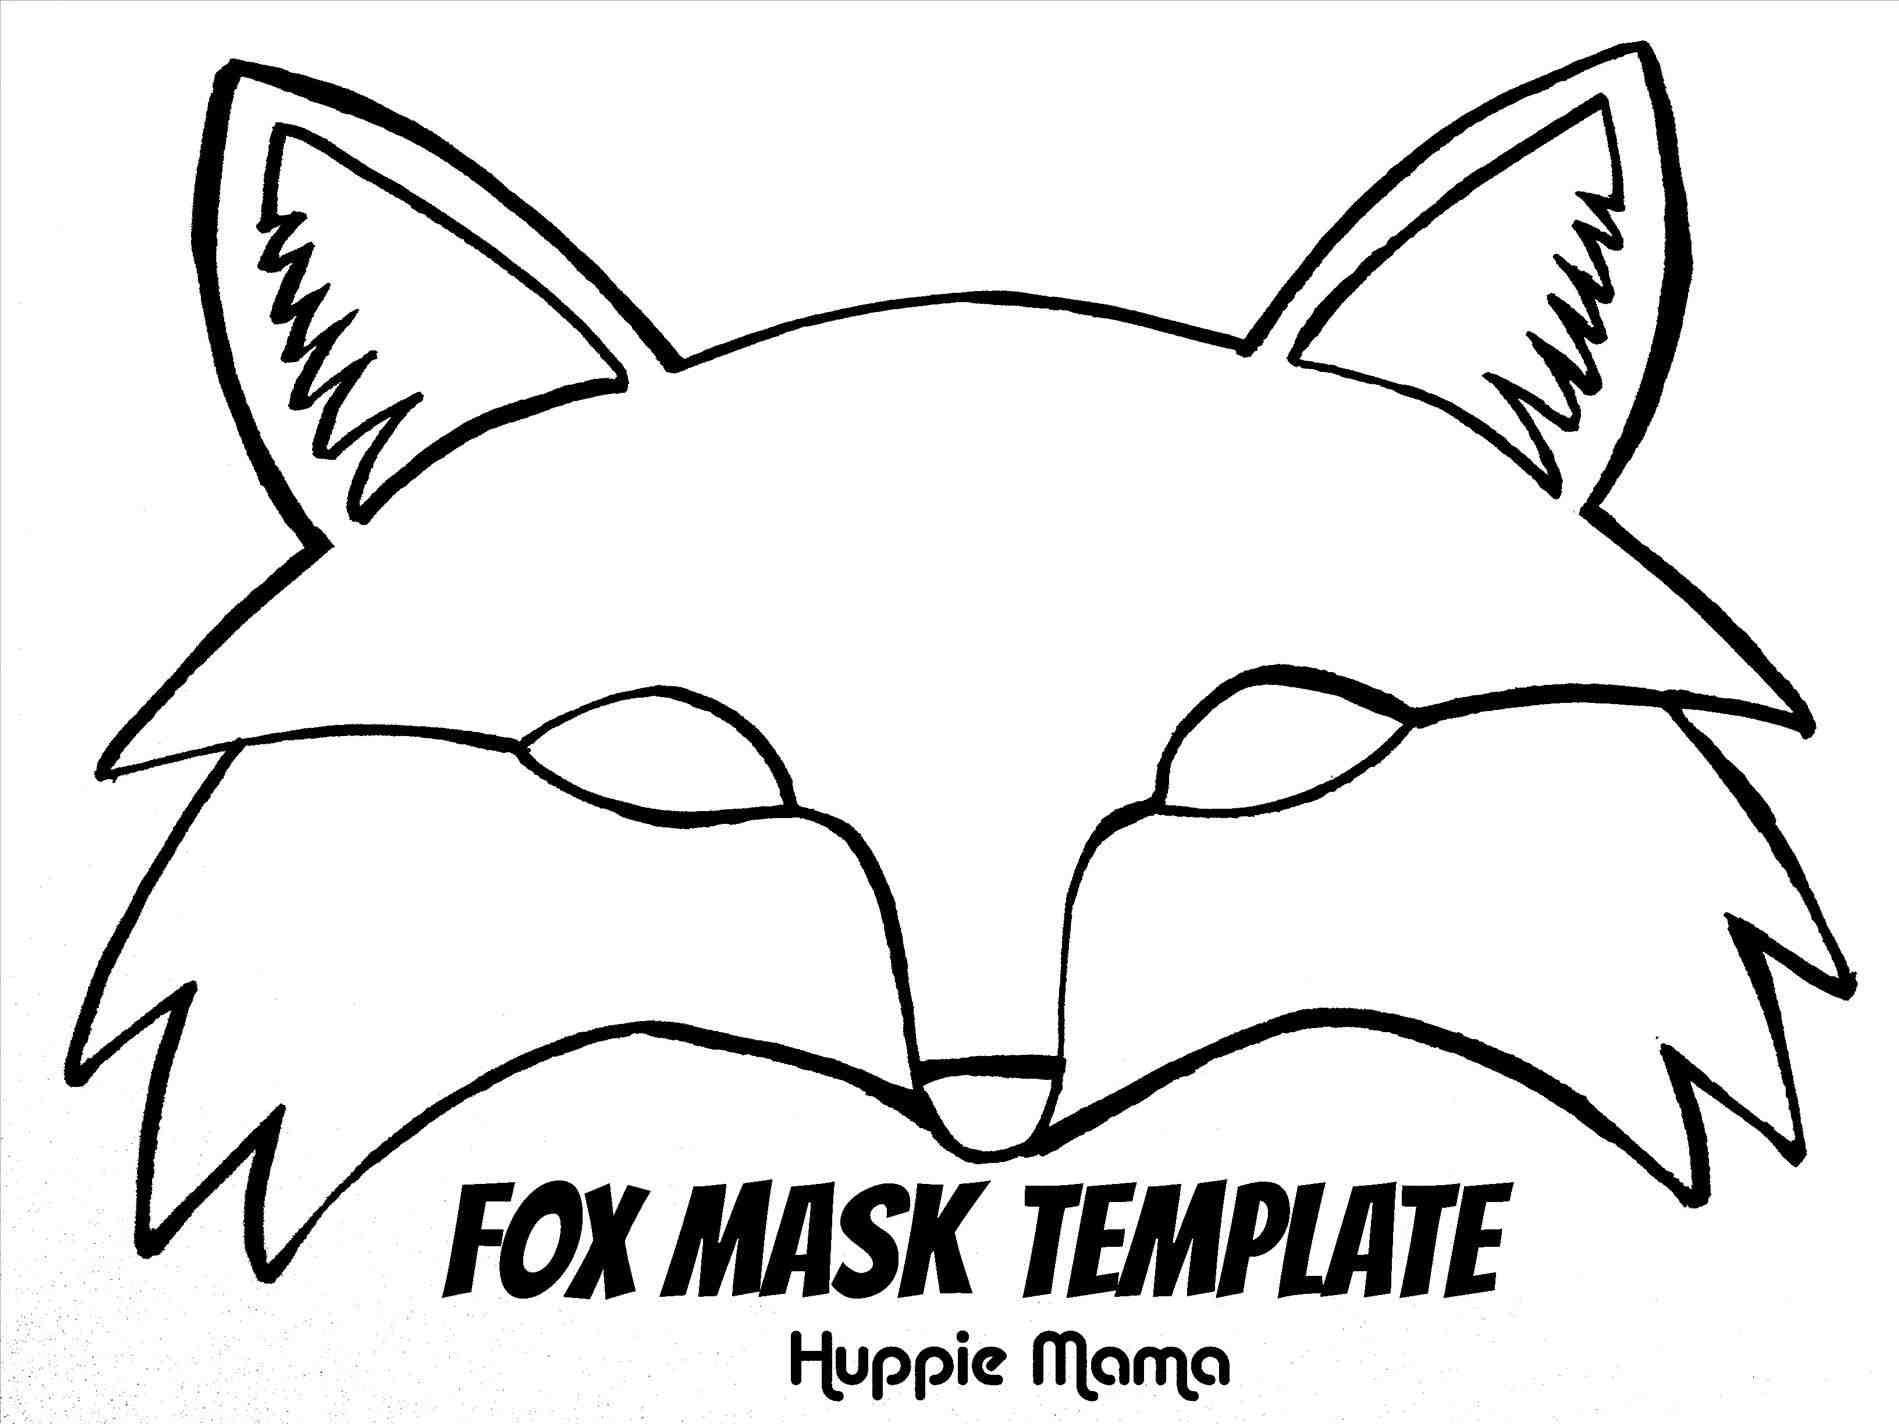 Pinbarbara Sinka On Kids | Pinterest | Animal Mask Templates - Free Printable Fox Mask Template